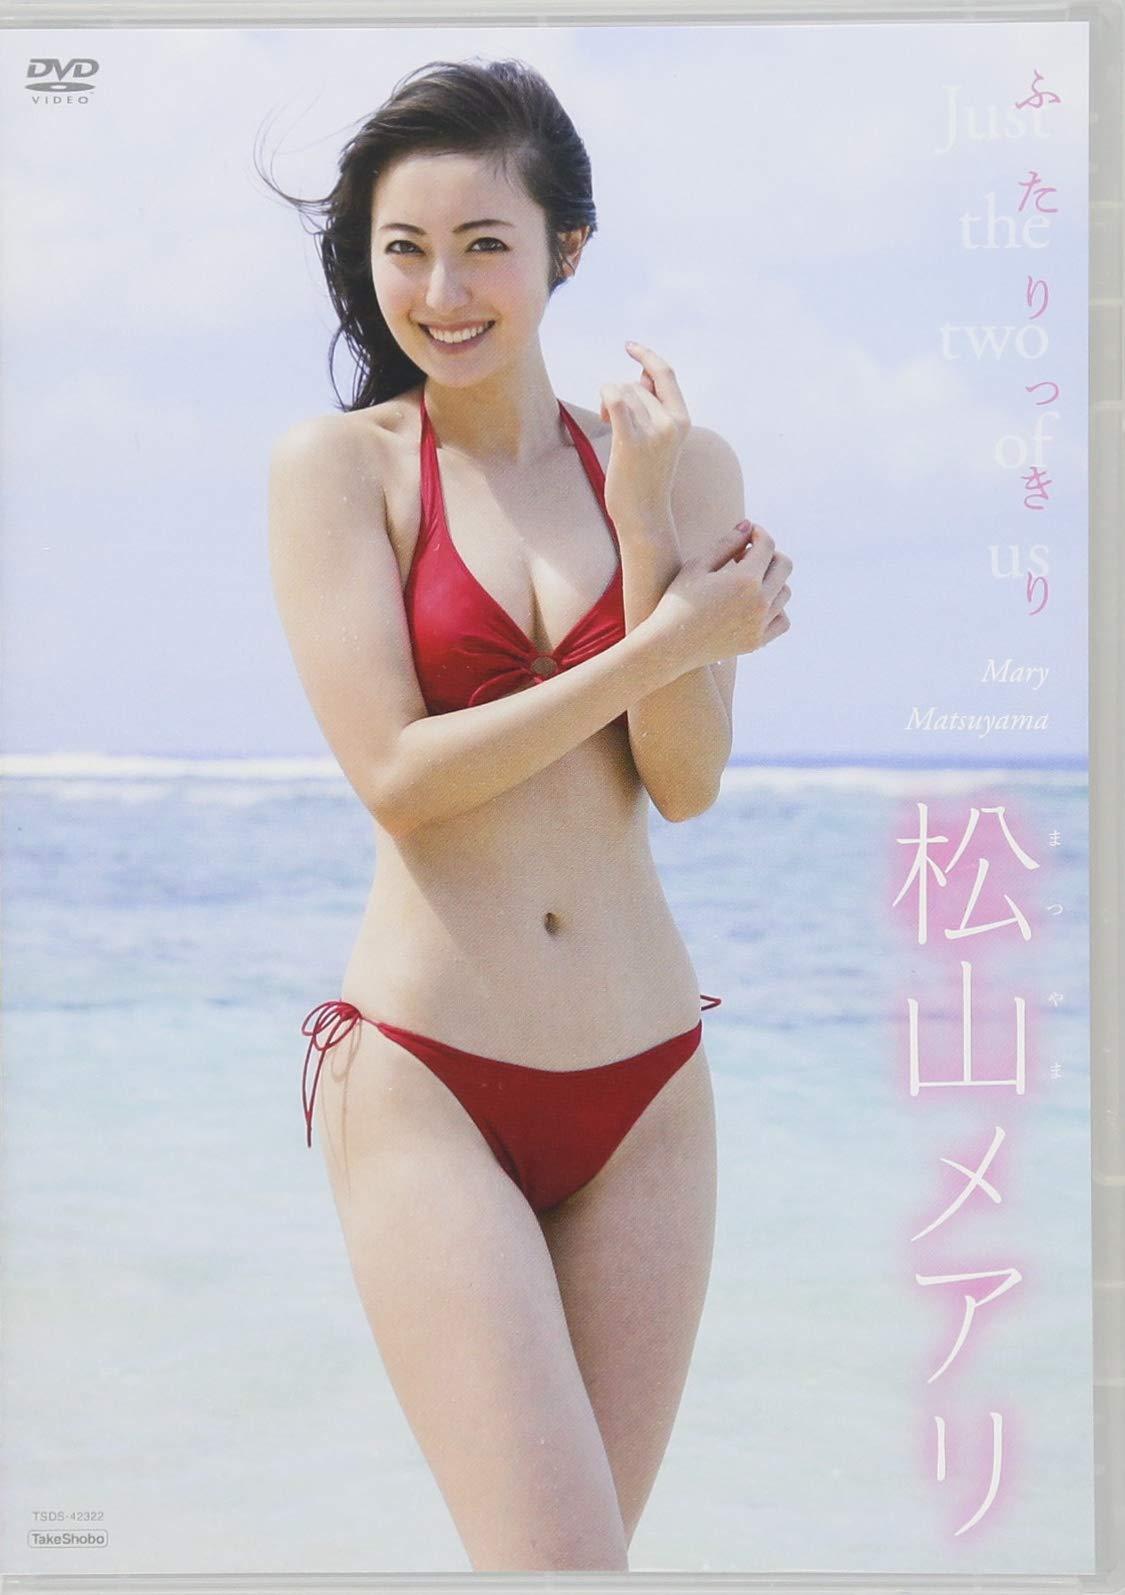 Amazon.co.jp: DVD>松山メアリ:ふたりっきり (<DVD>): 松山メアリ: 本